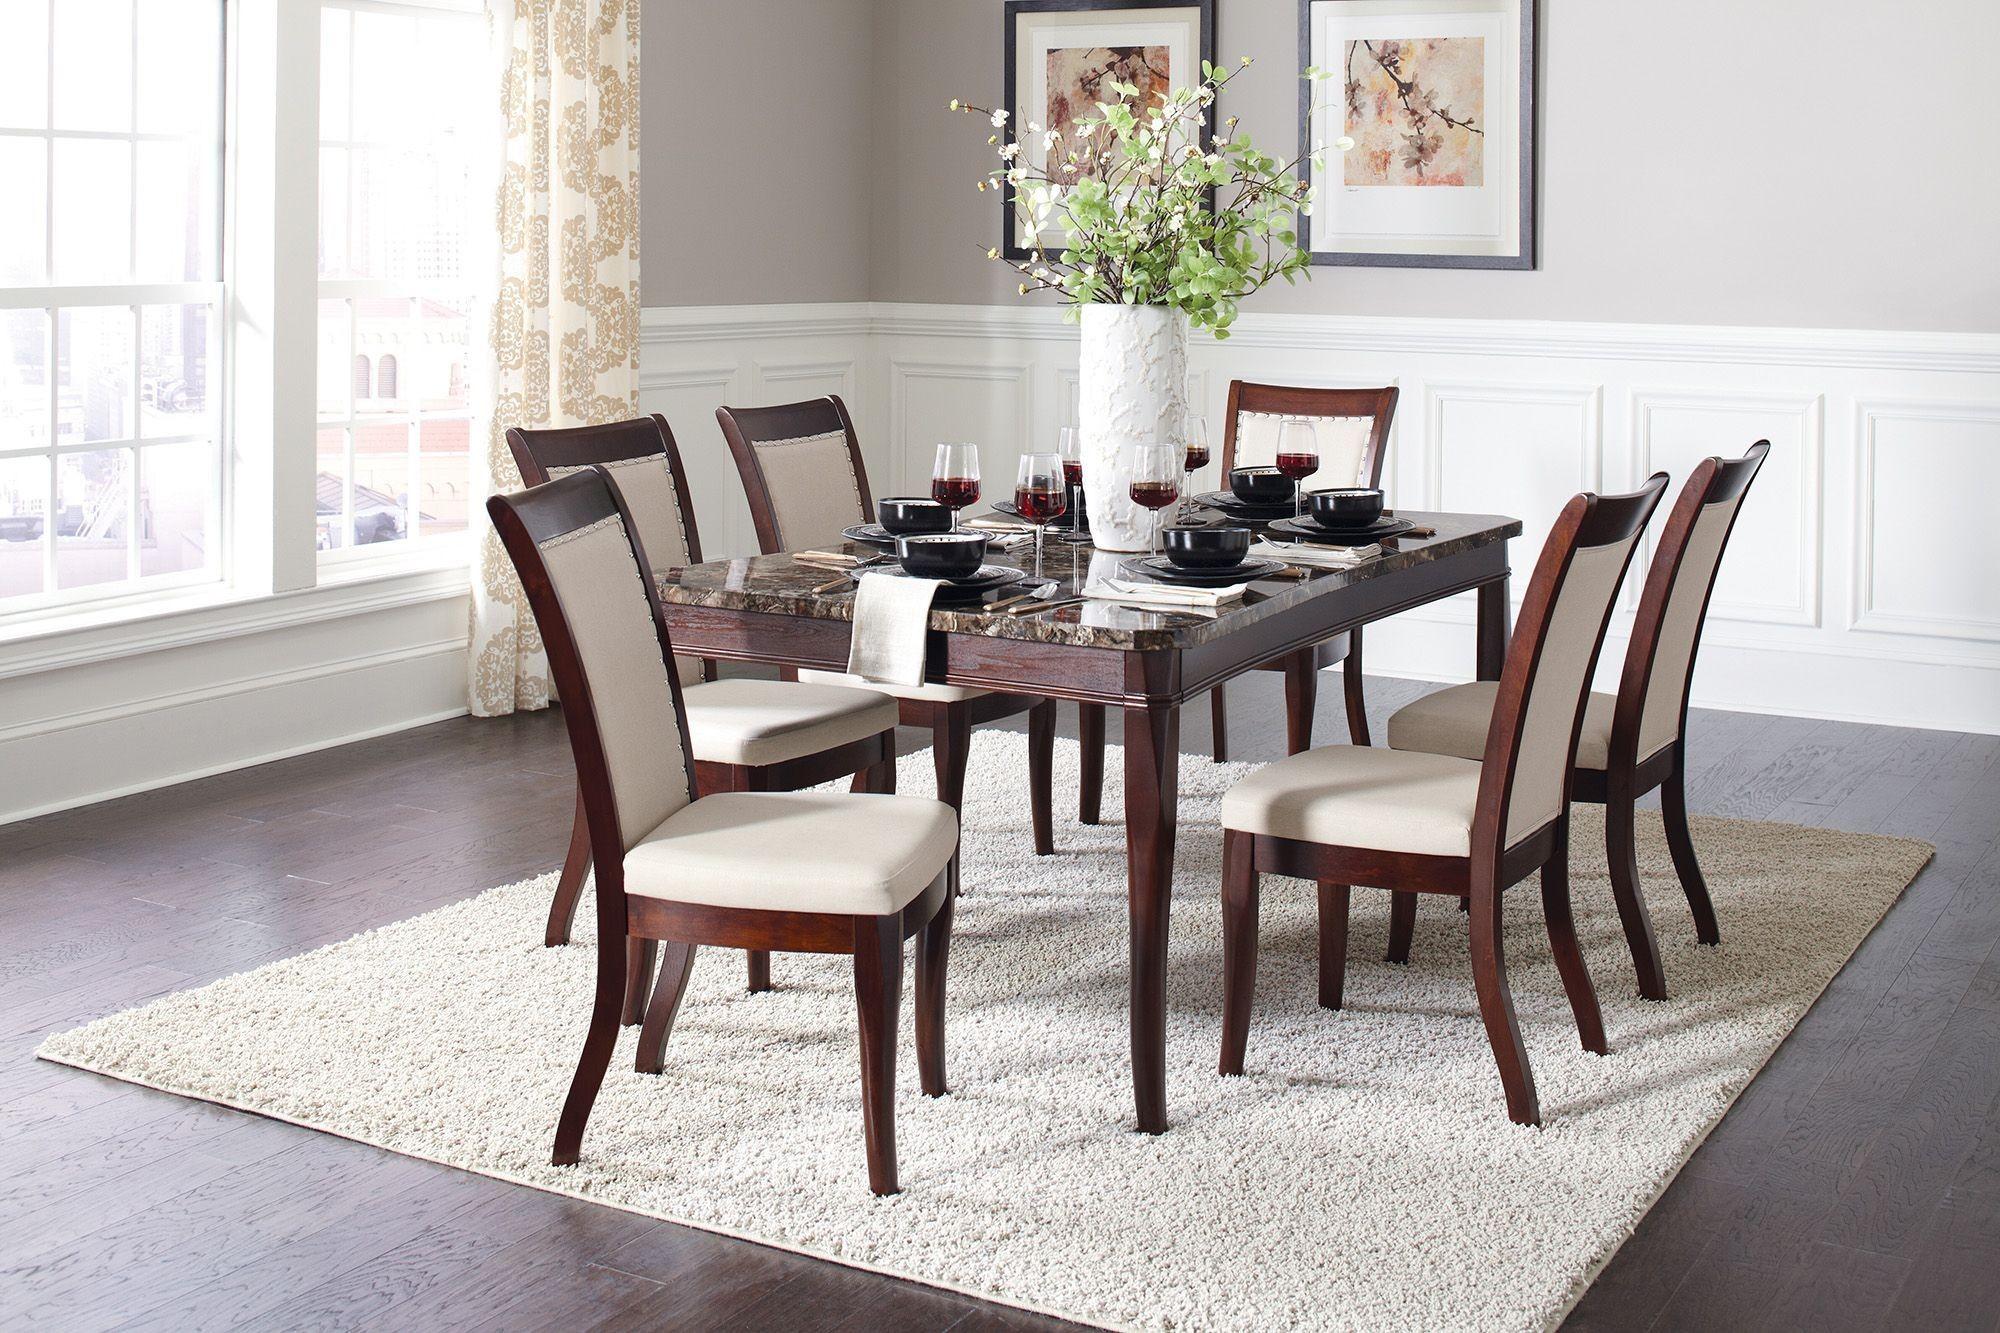 Cornett Dark Brown Dining Room Set from Coaster | Coleman Furniture